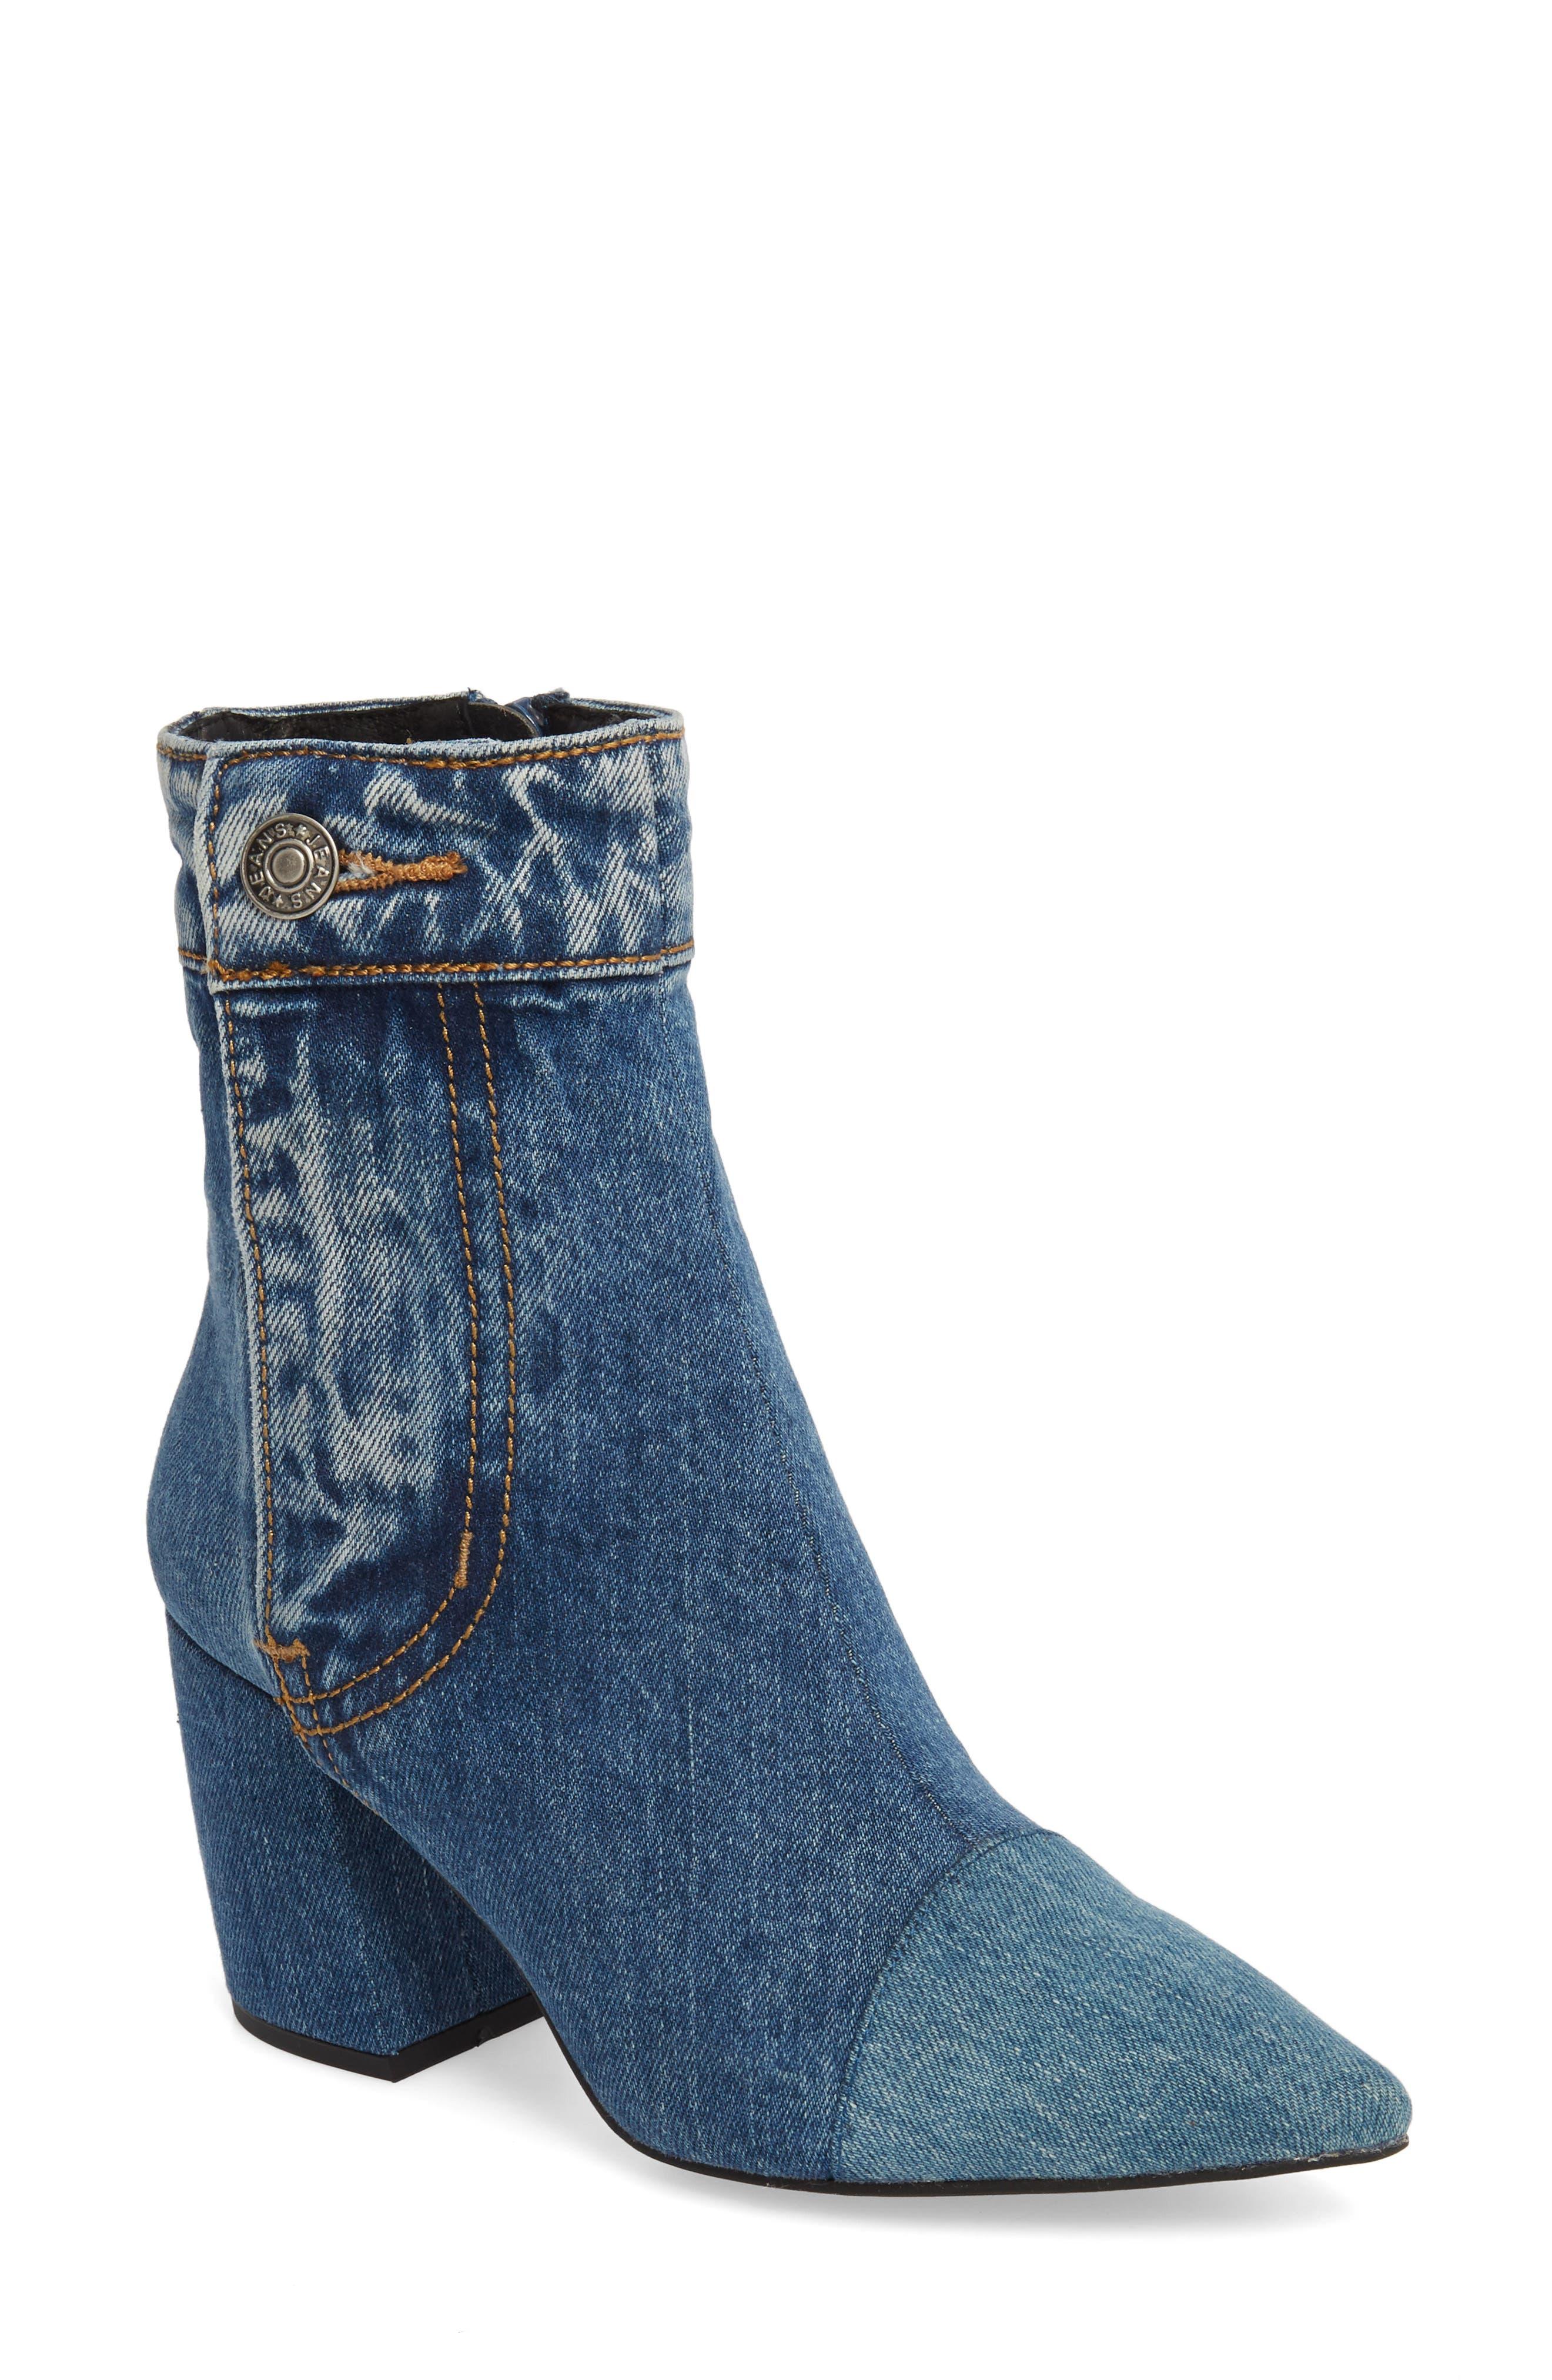 JEFFREY CAMPBELL Finite Block Heel Bootie, Main, color, BLUE DENIM